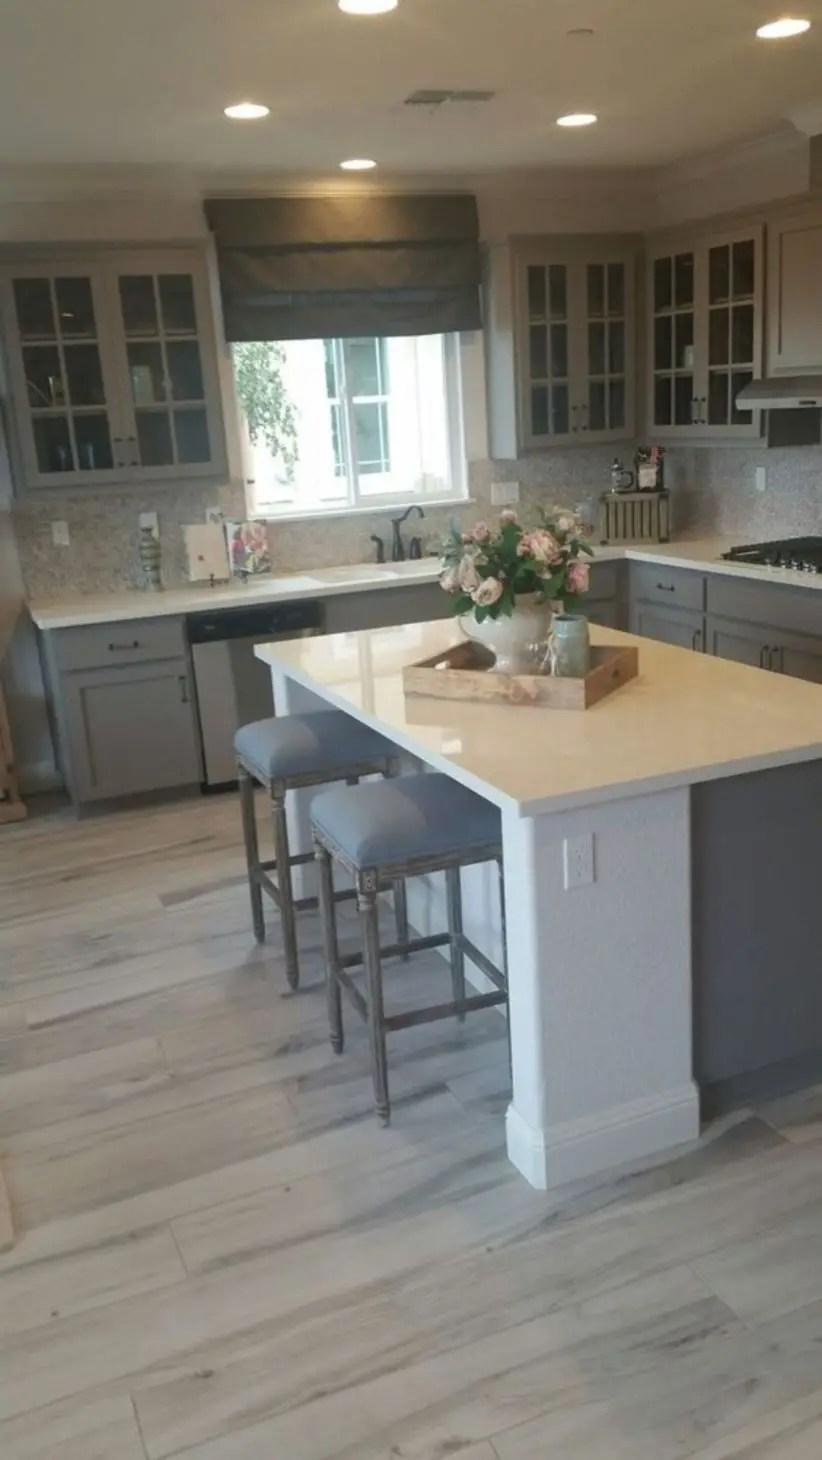 Kitchen floor tile that looks like wood